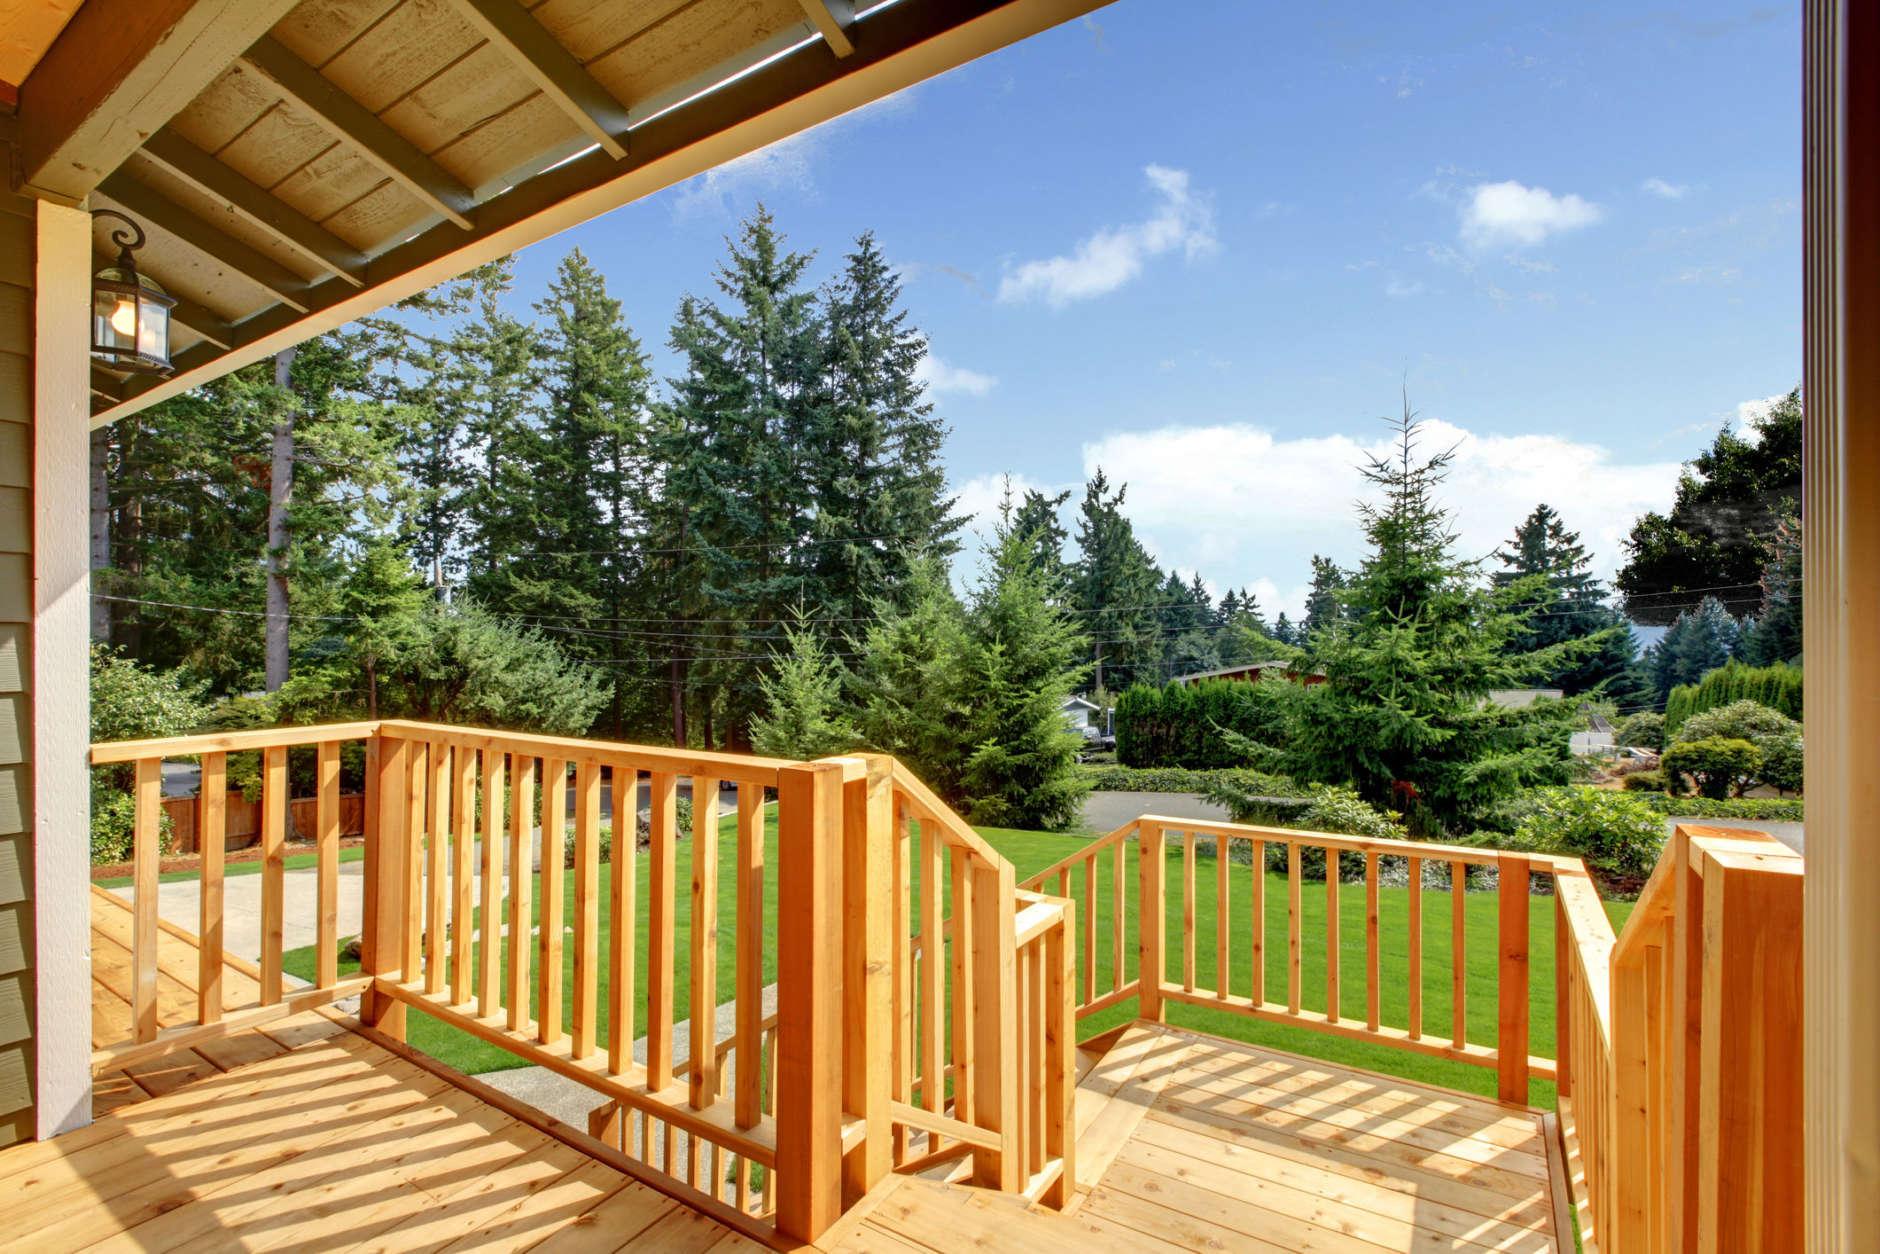 Wooden walkout deck with patio area overlooking backyard. Northwest, USA